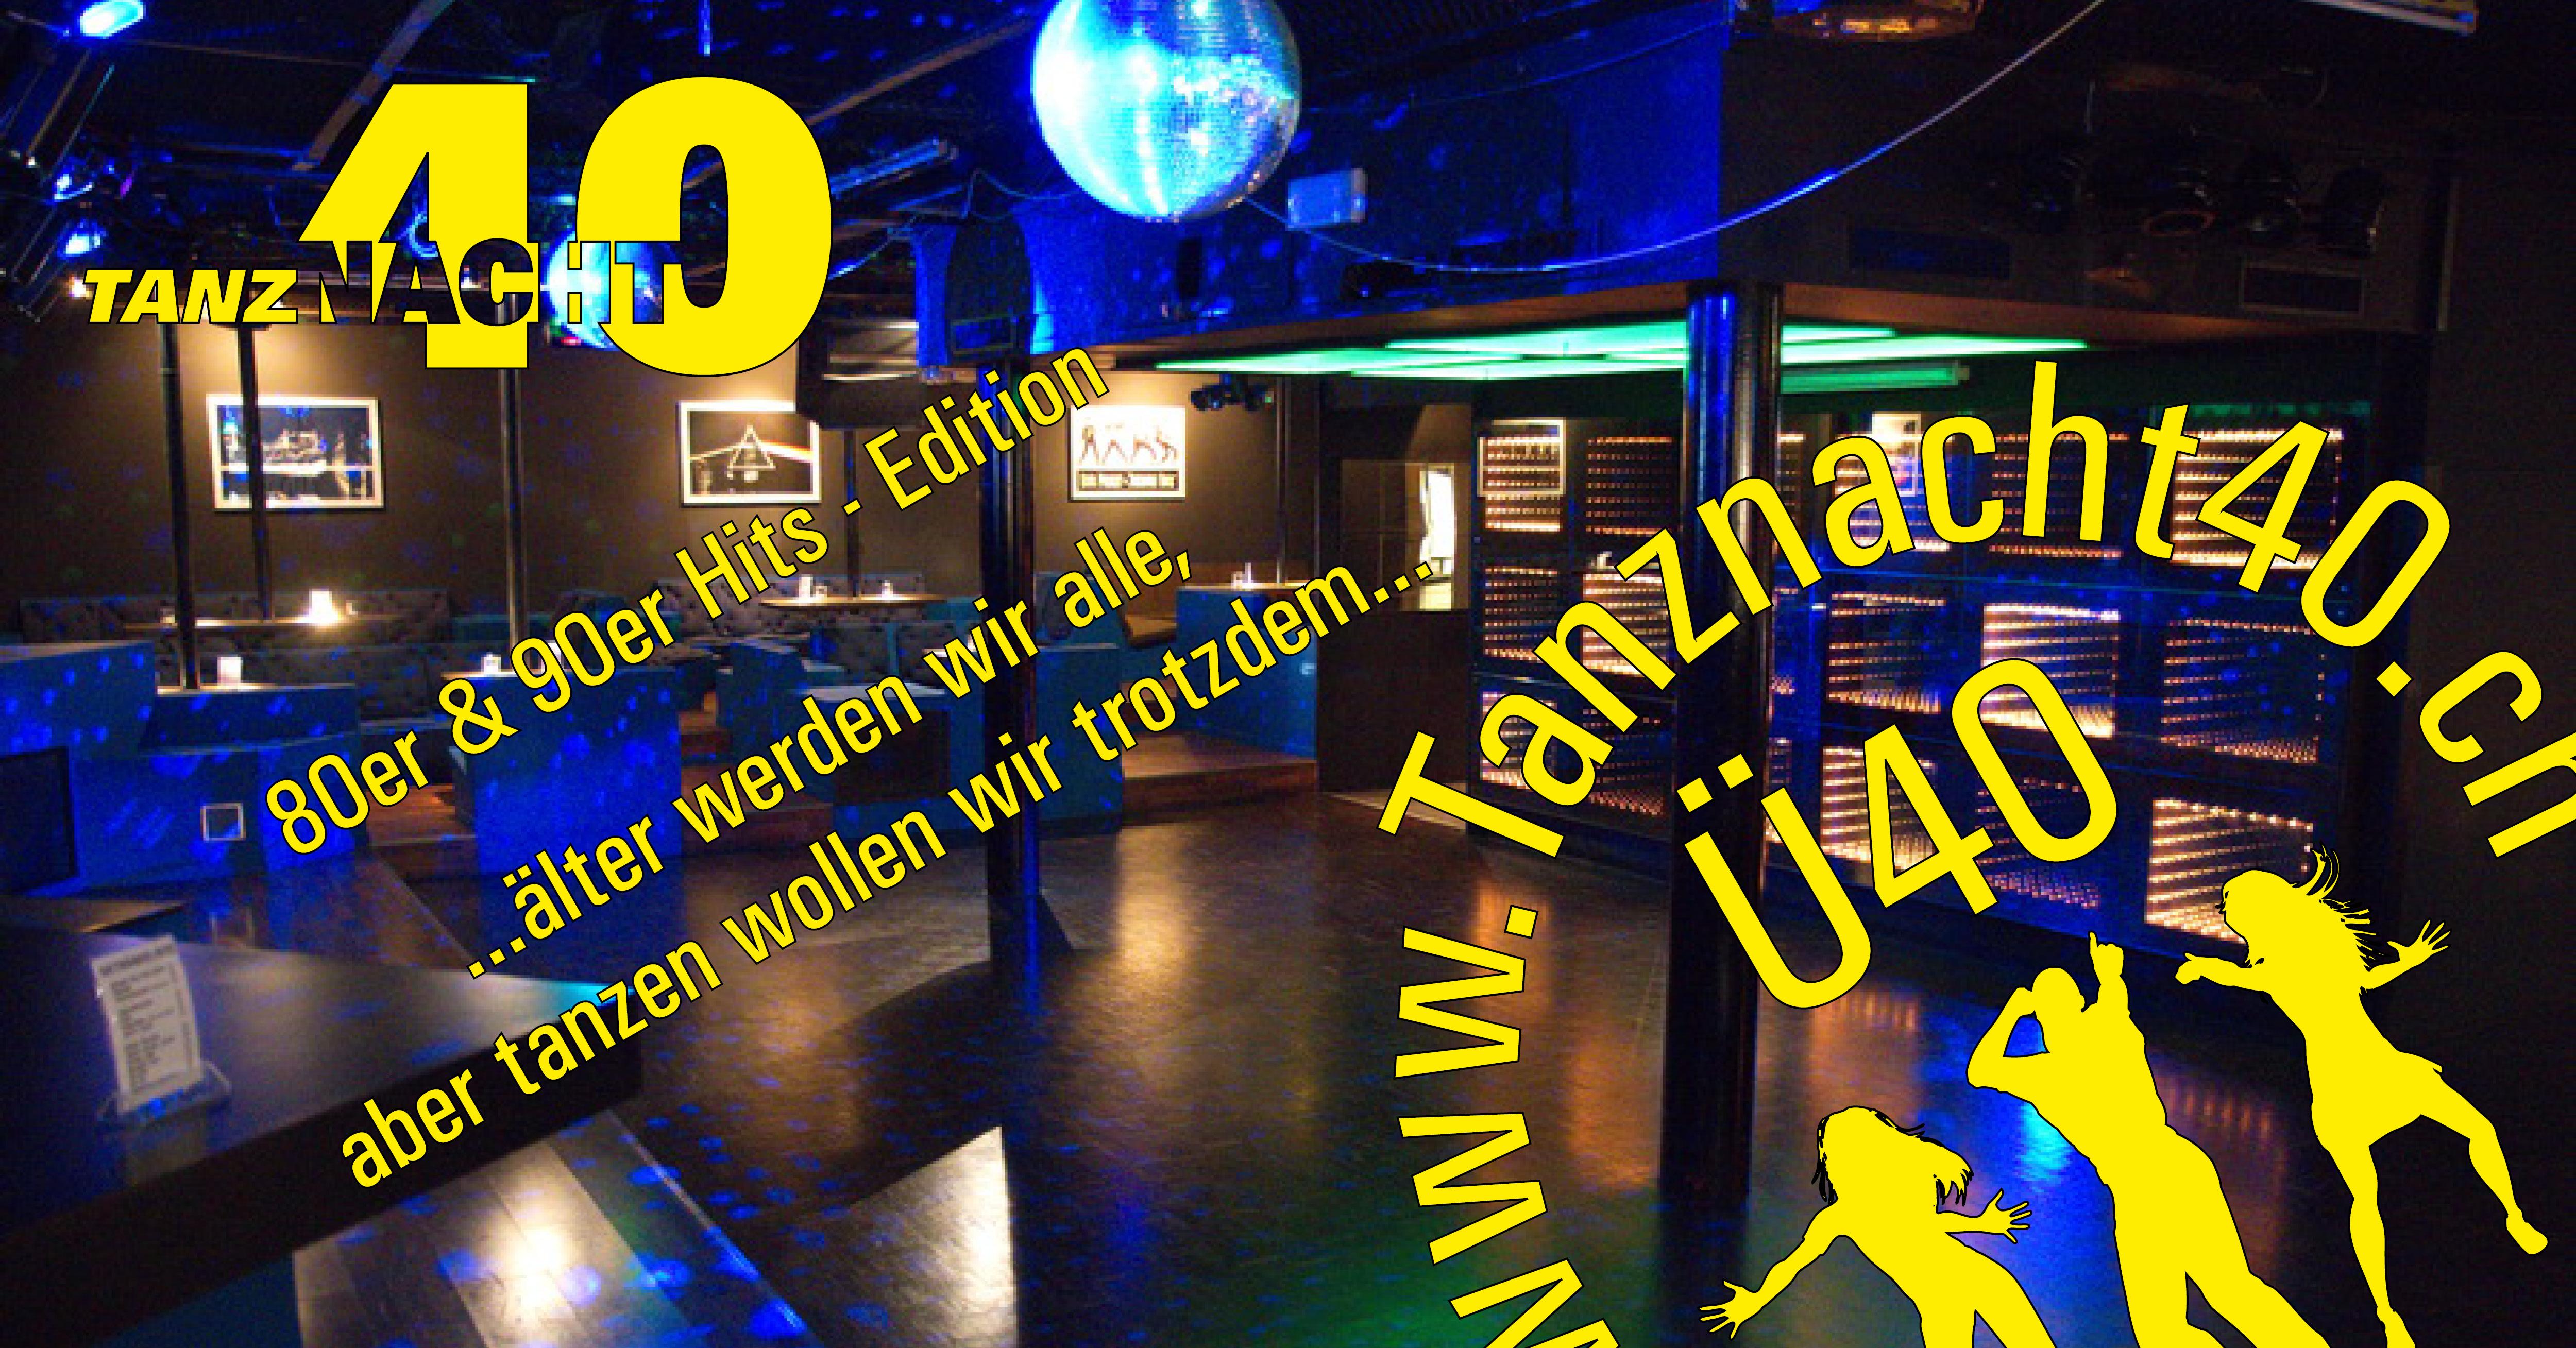 Tanznacht40 - 80/90er Edition